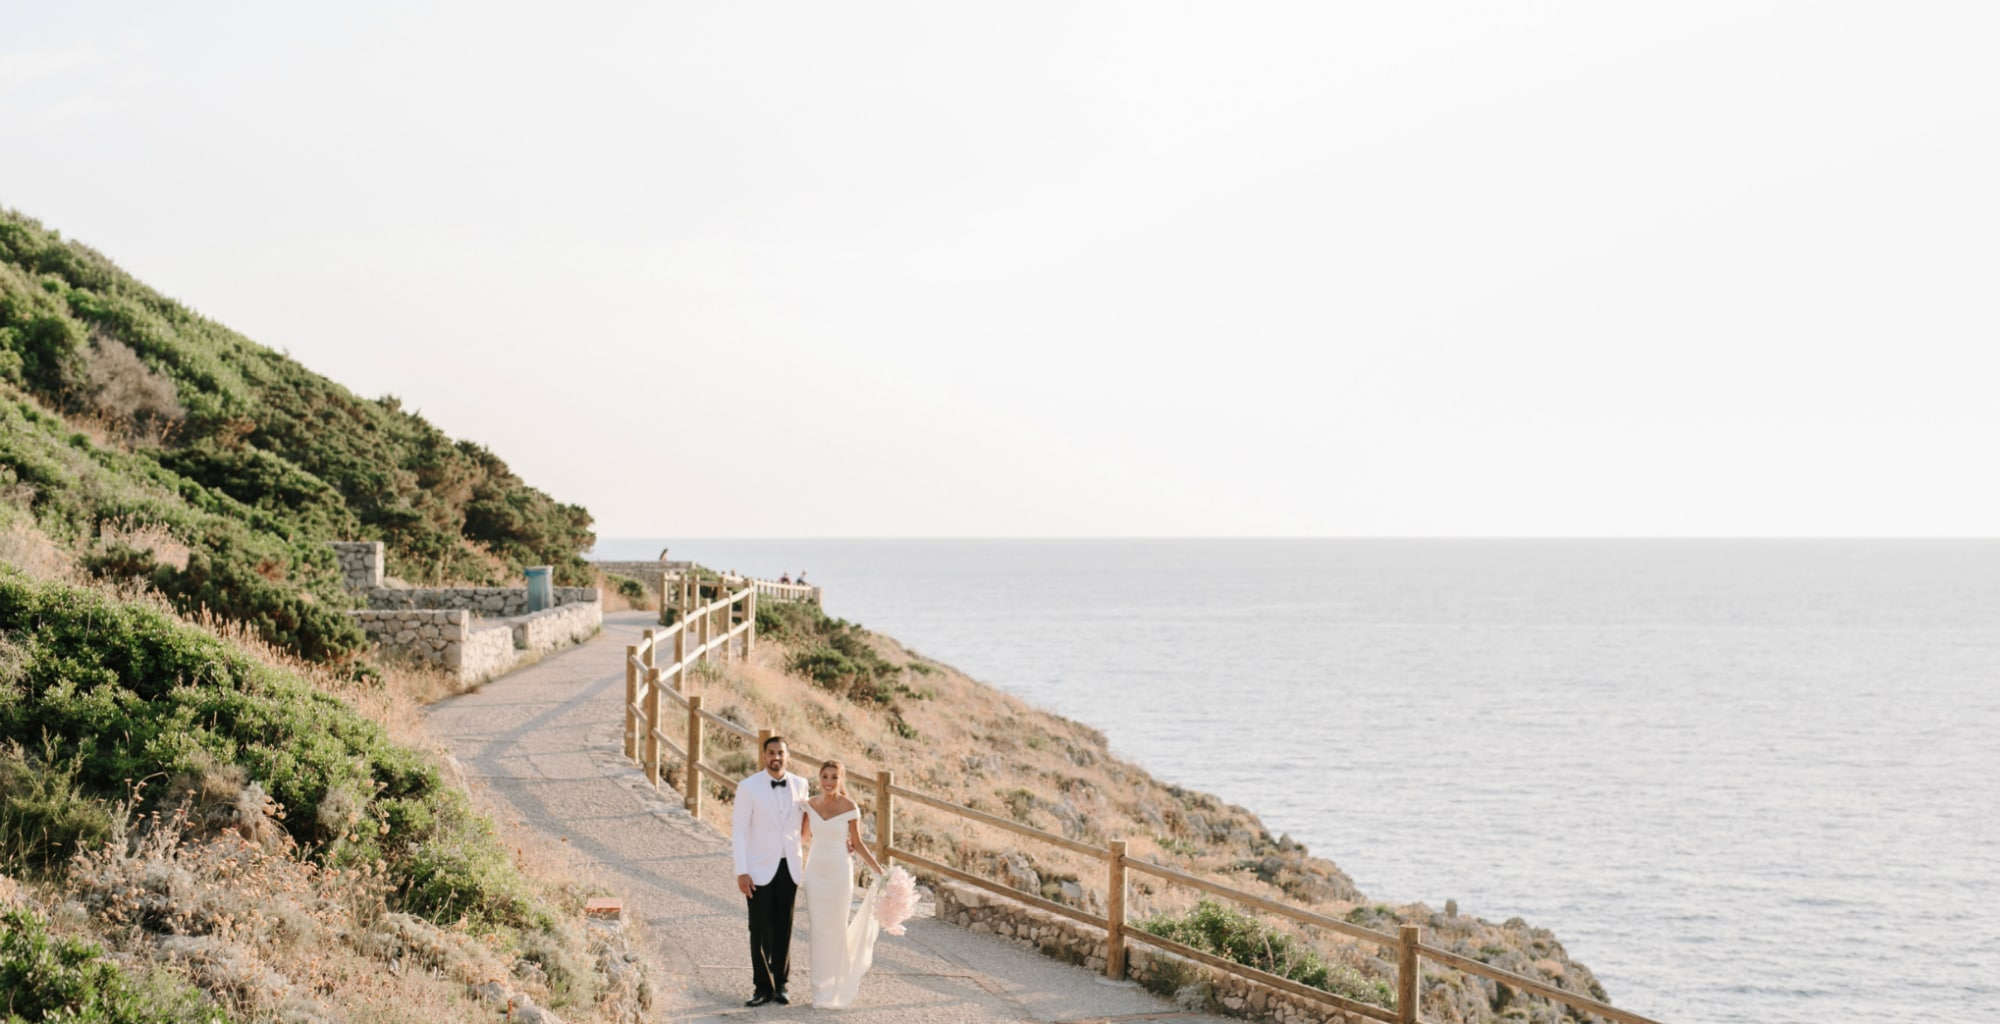 WEDDING ON CAPRI AND ON THE AMALFI COAST